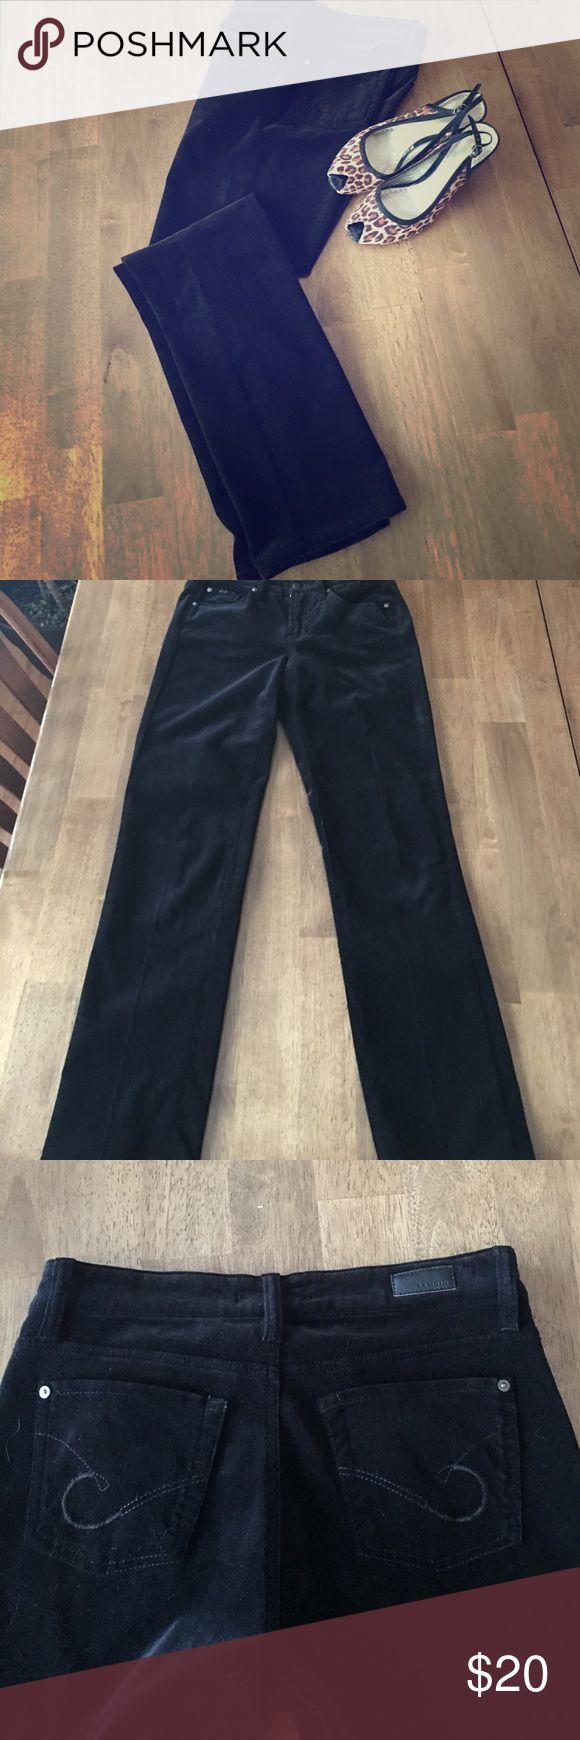 Cambio black velveteen 5 pocket jeans. Cambio black velveteen  jeans, 5 pocket, size 6. Excellent condition, never worn. cambio Jeans Straight Leg